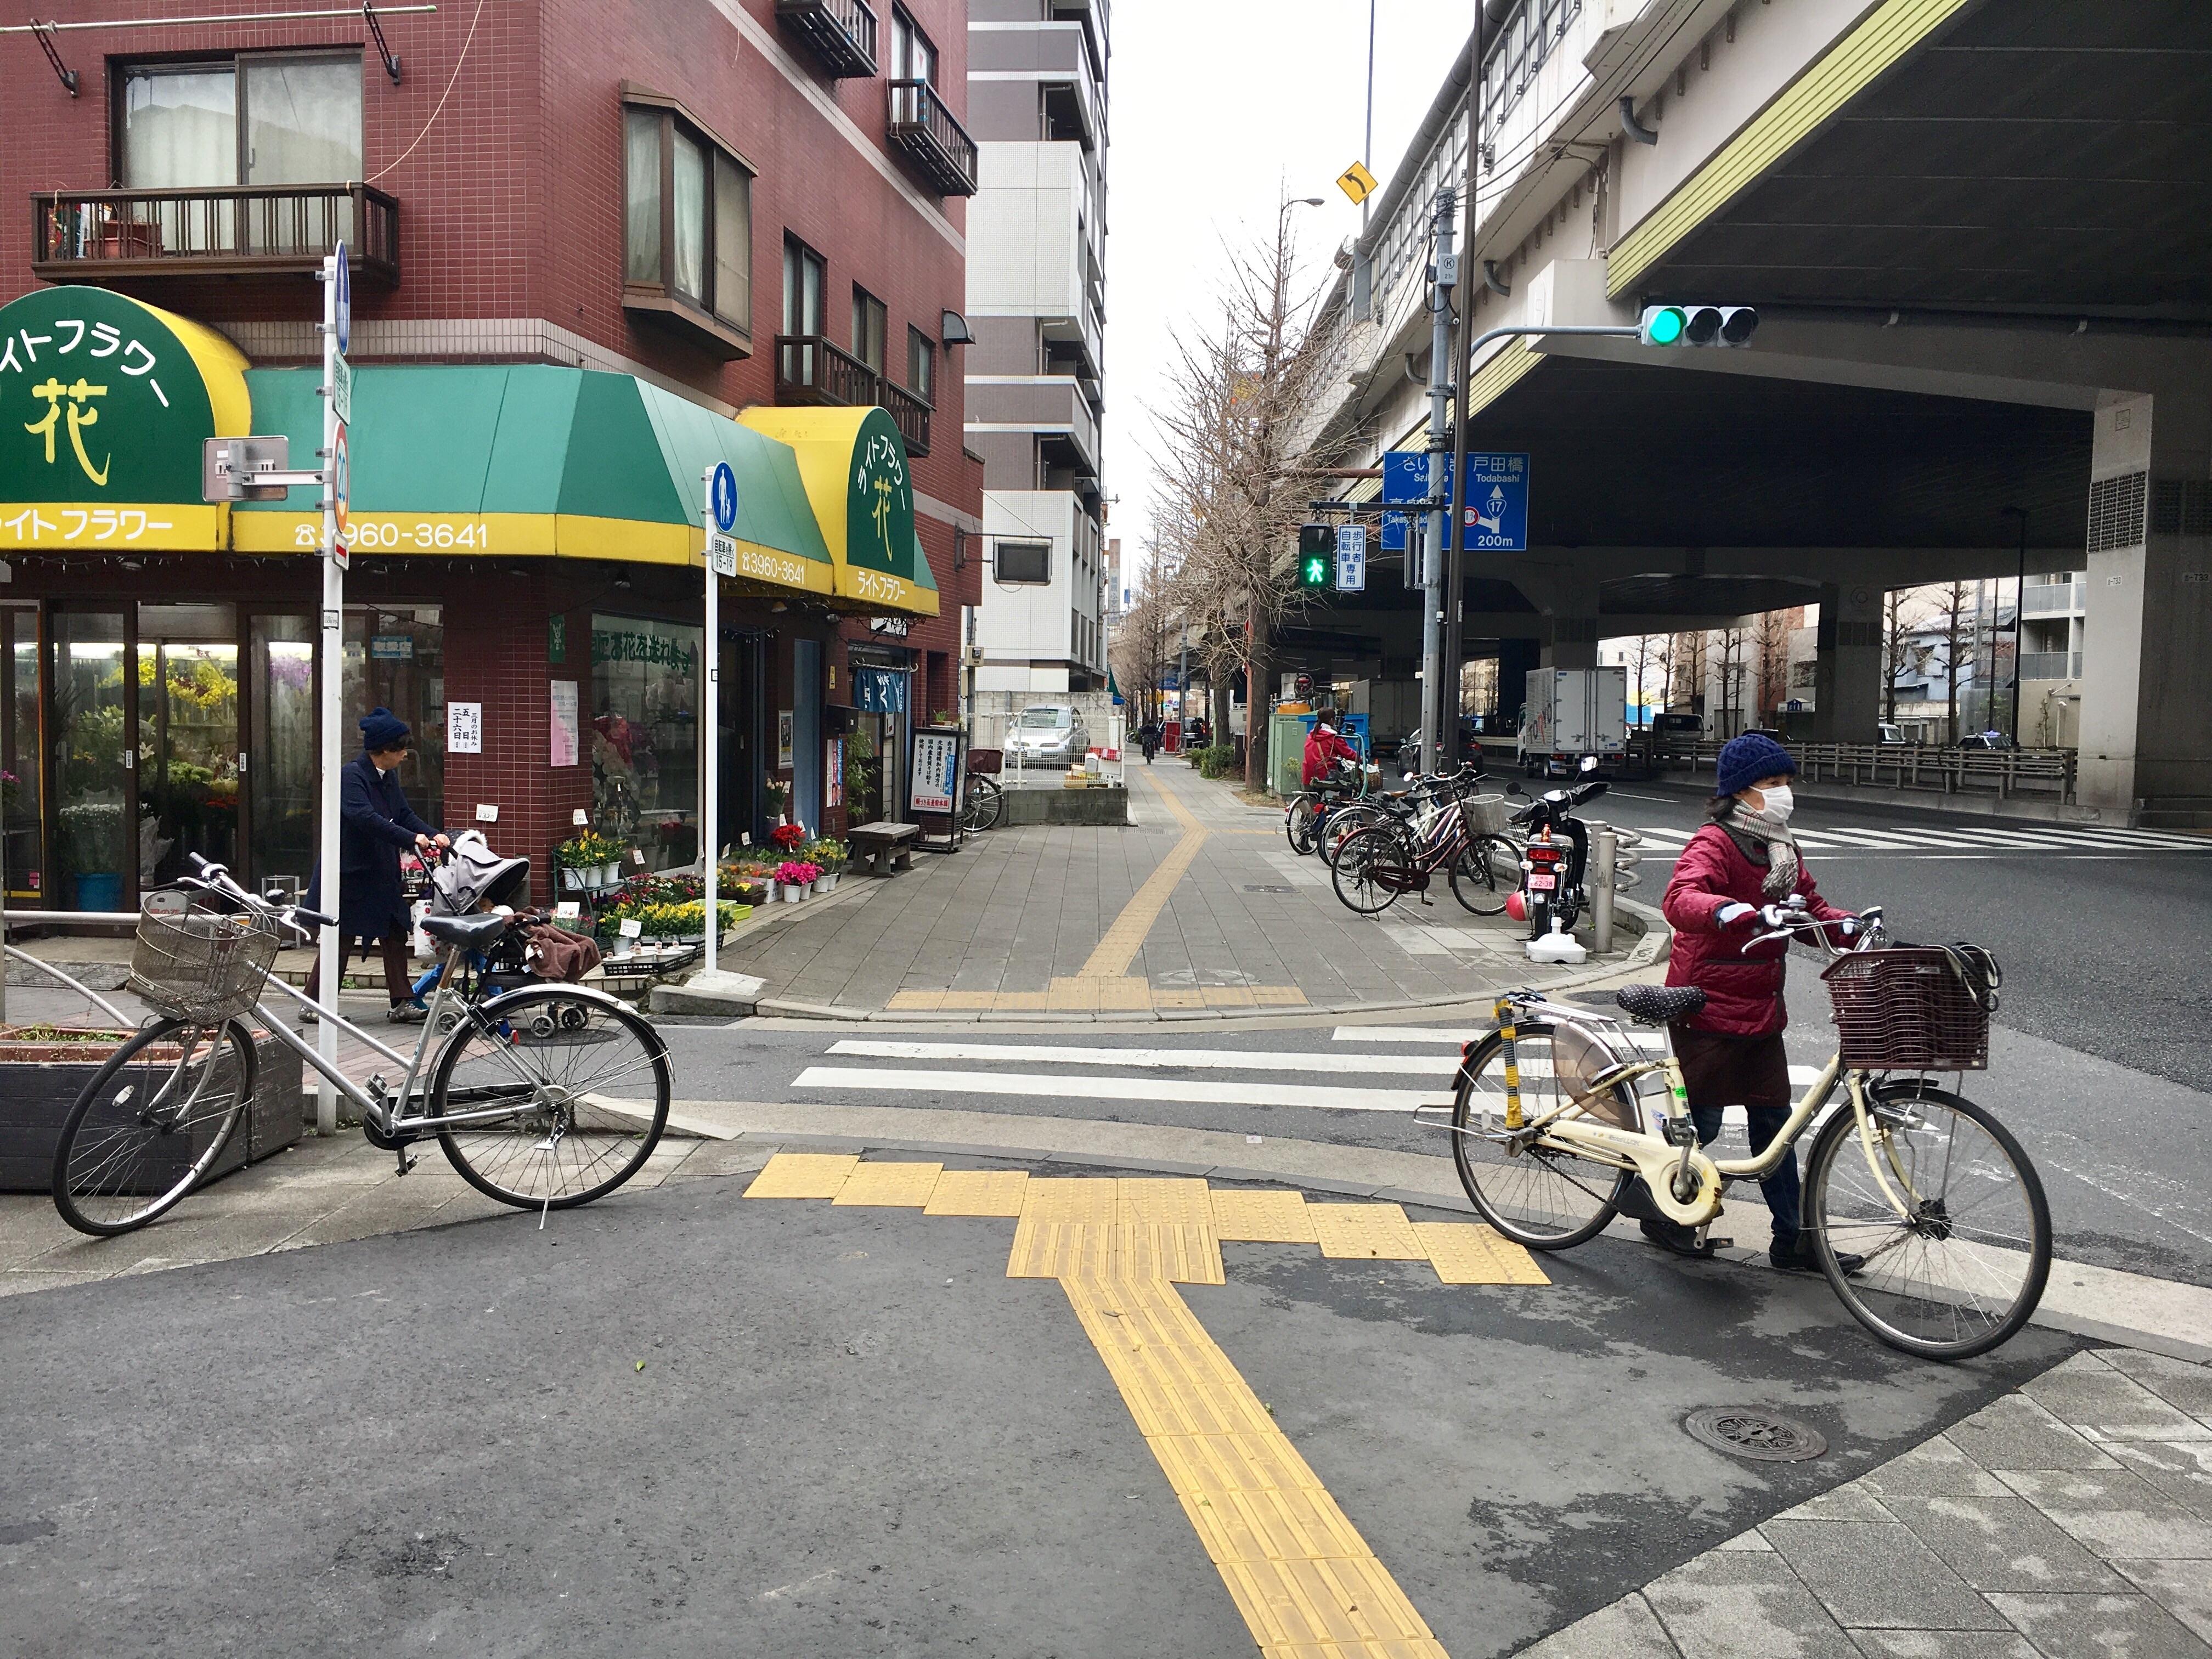 f:id:SoichiroIkeshita:20170315141758j:image